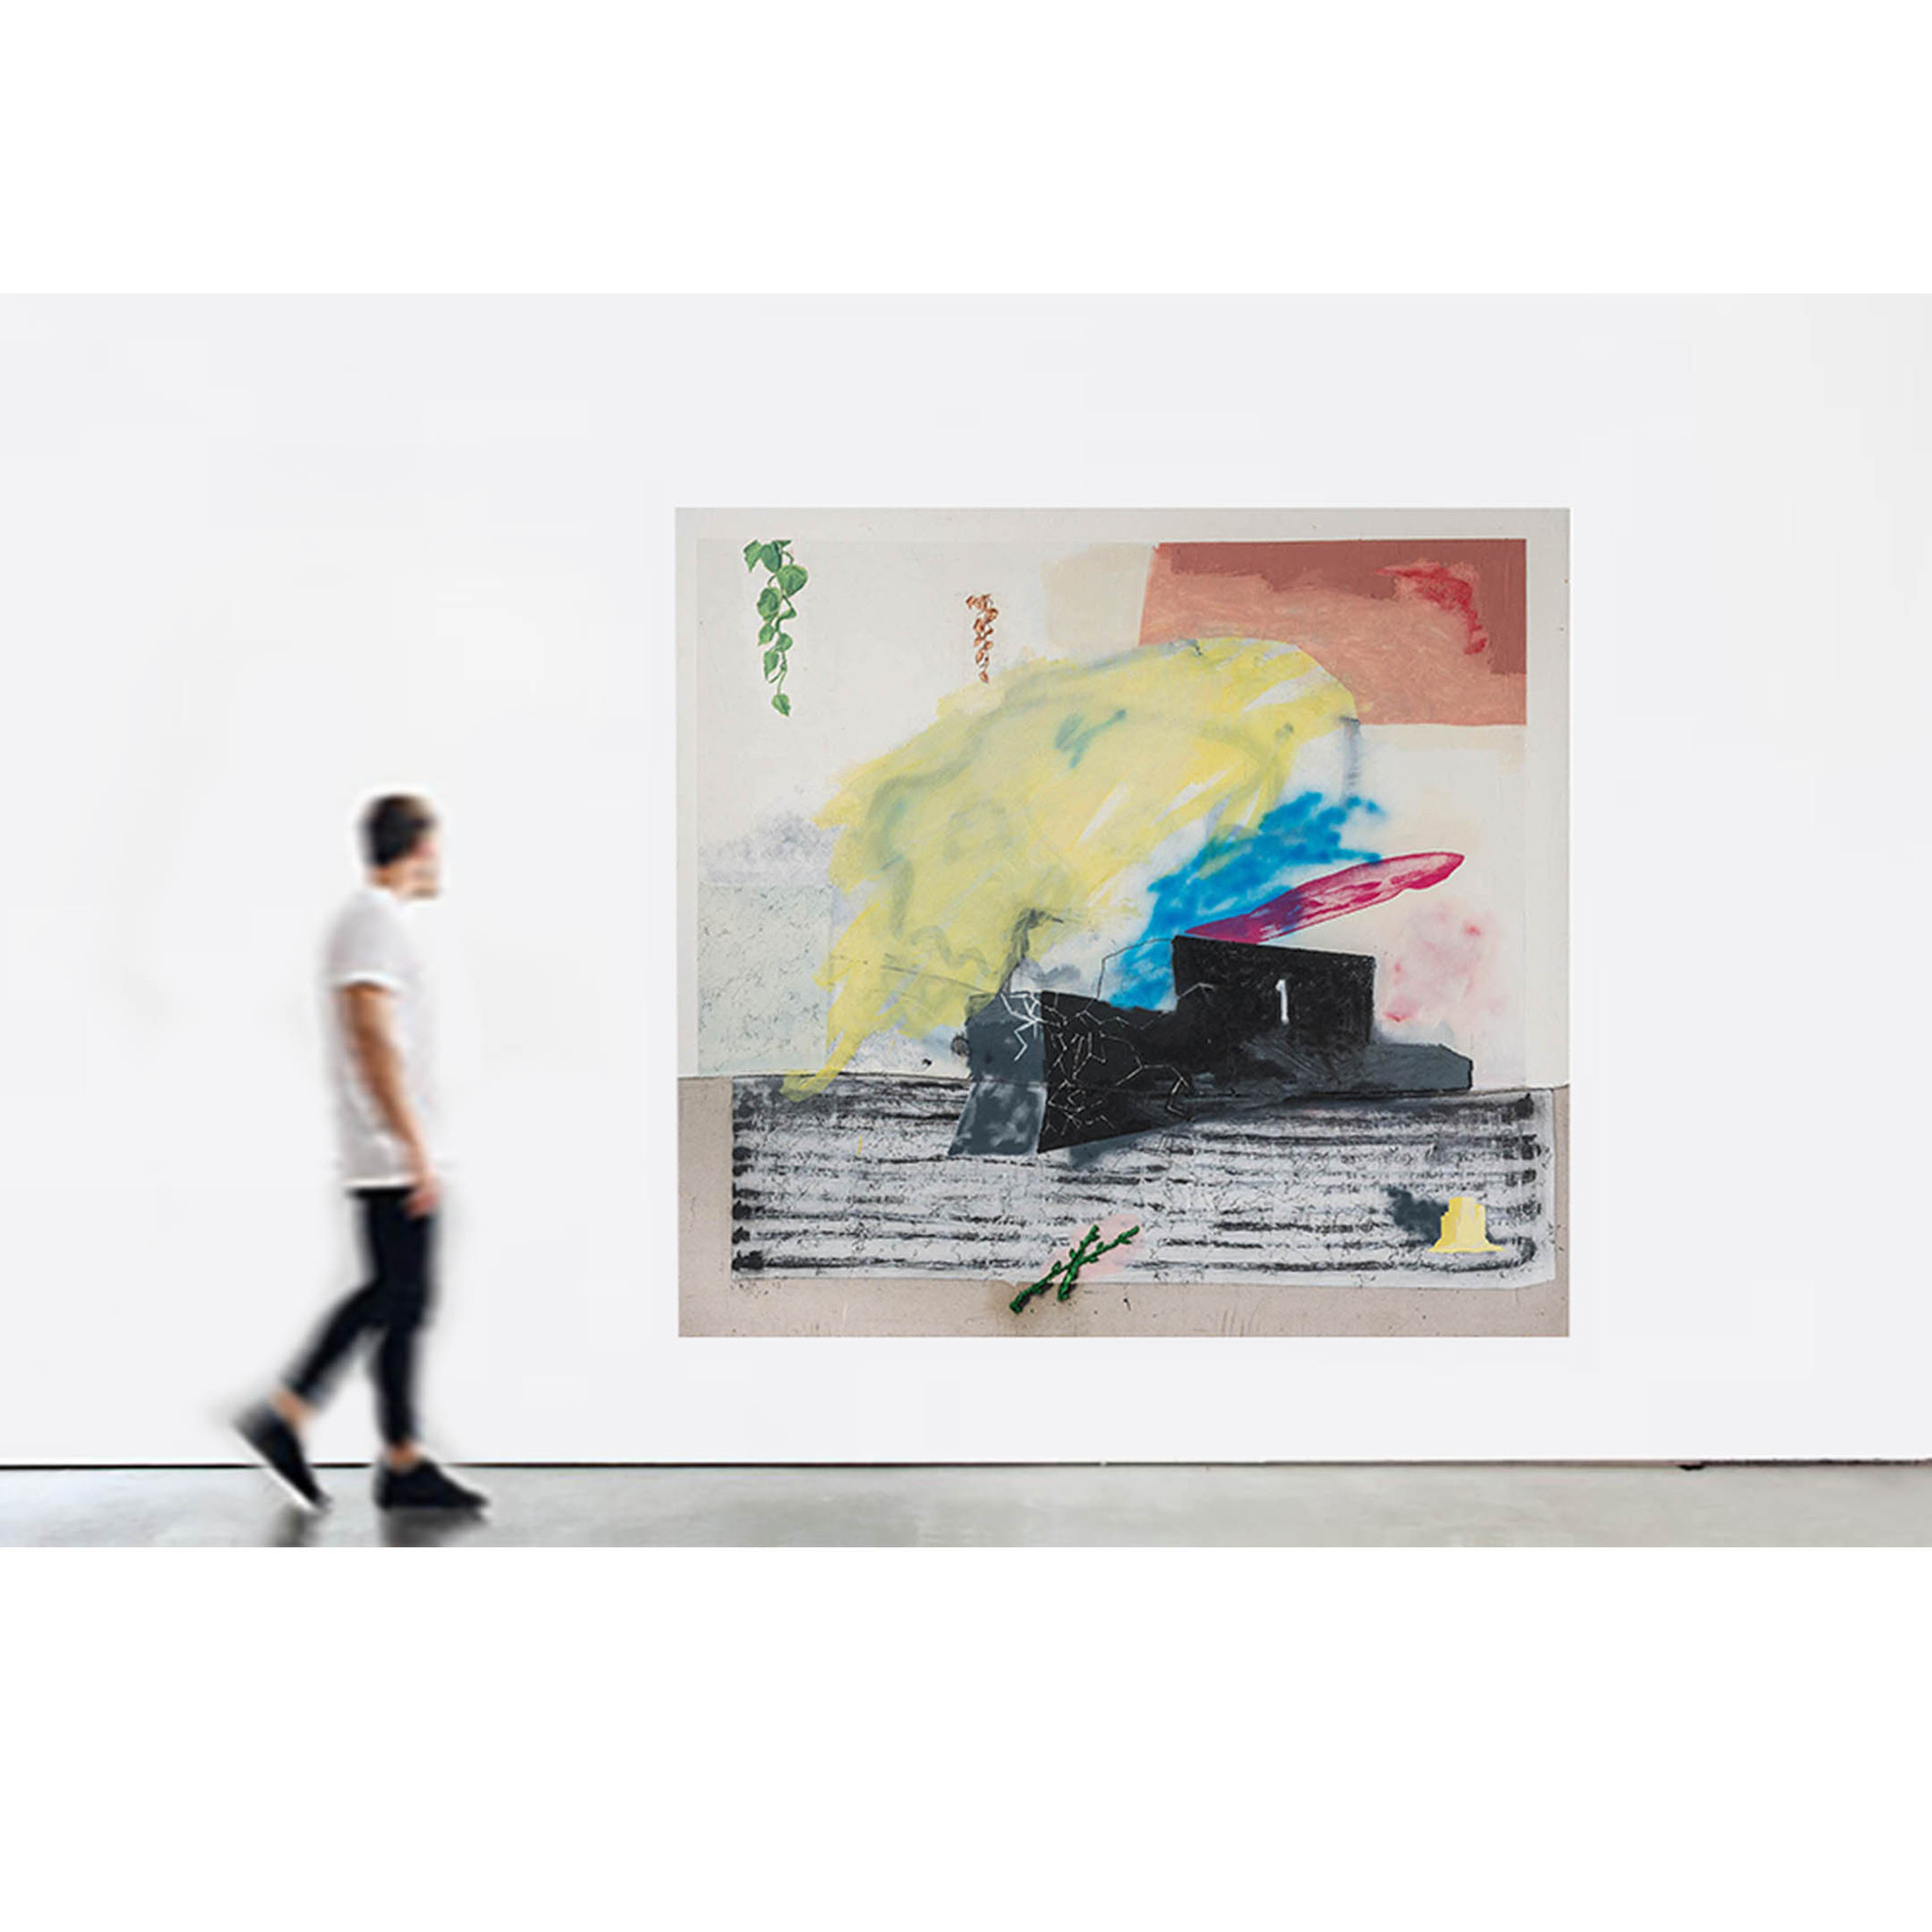 5 siti per comprare arte online | Living Corriere